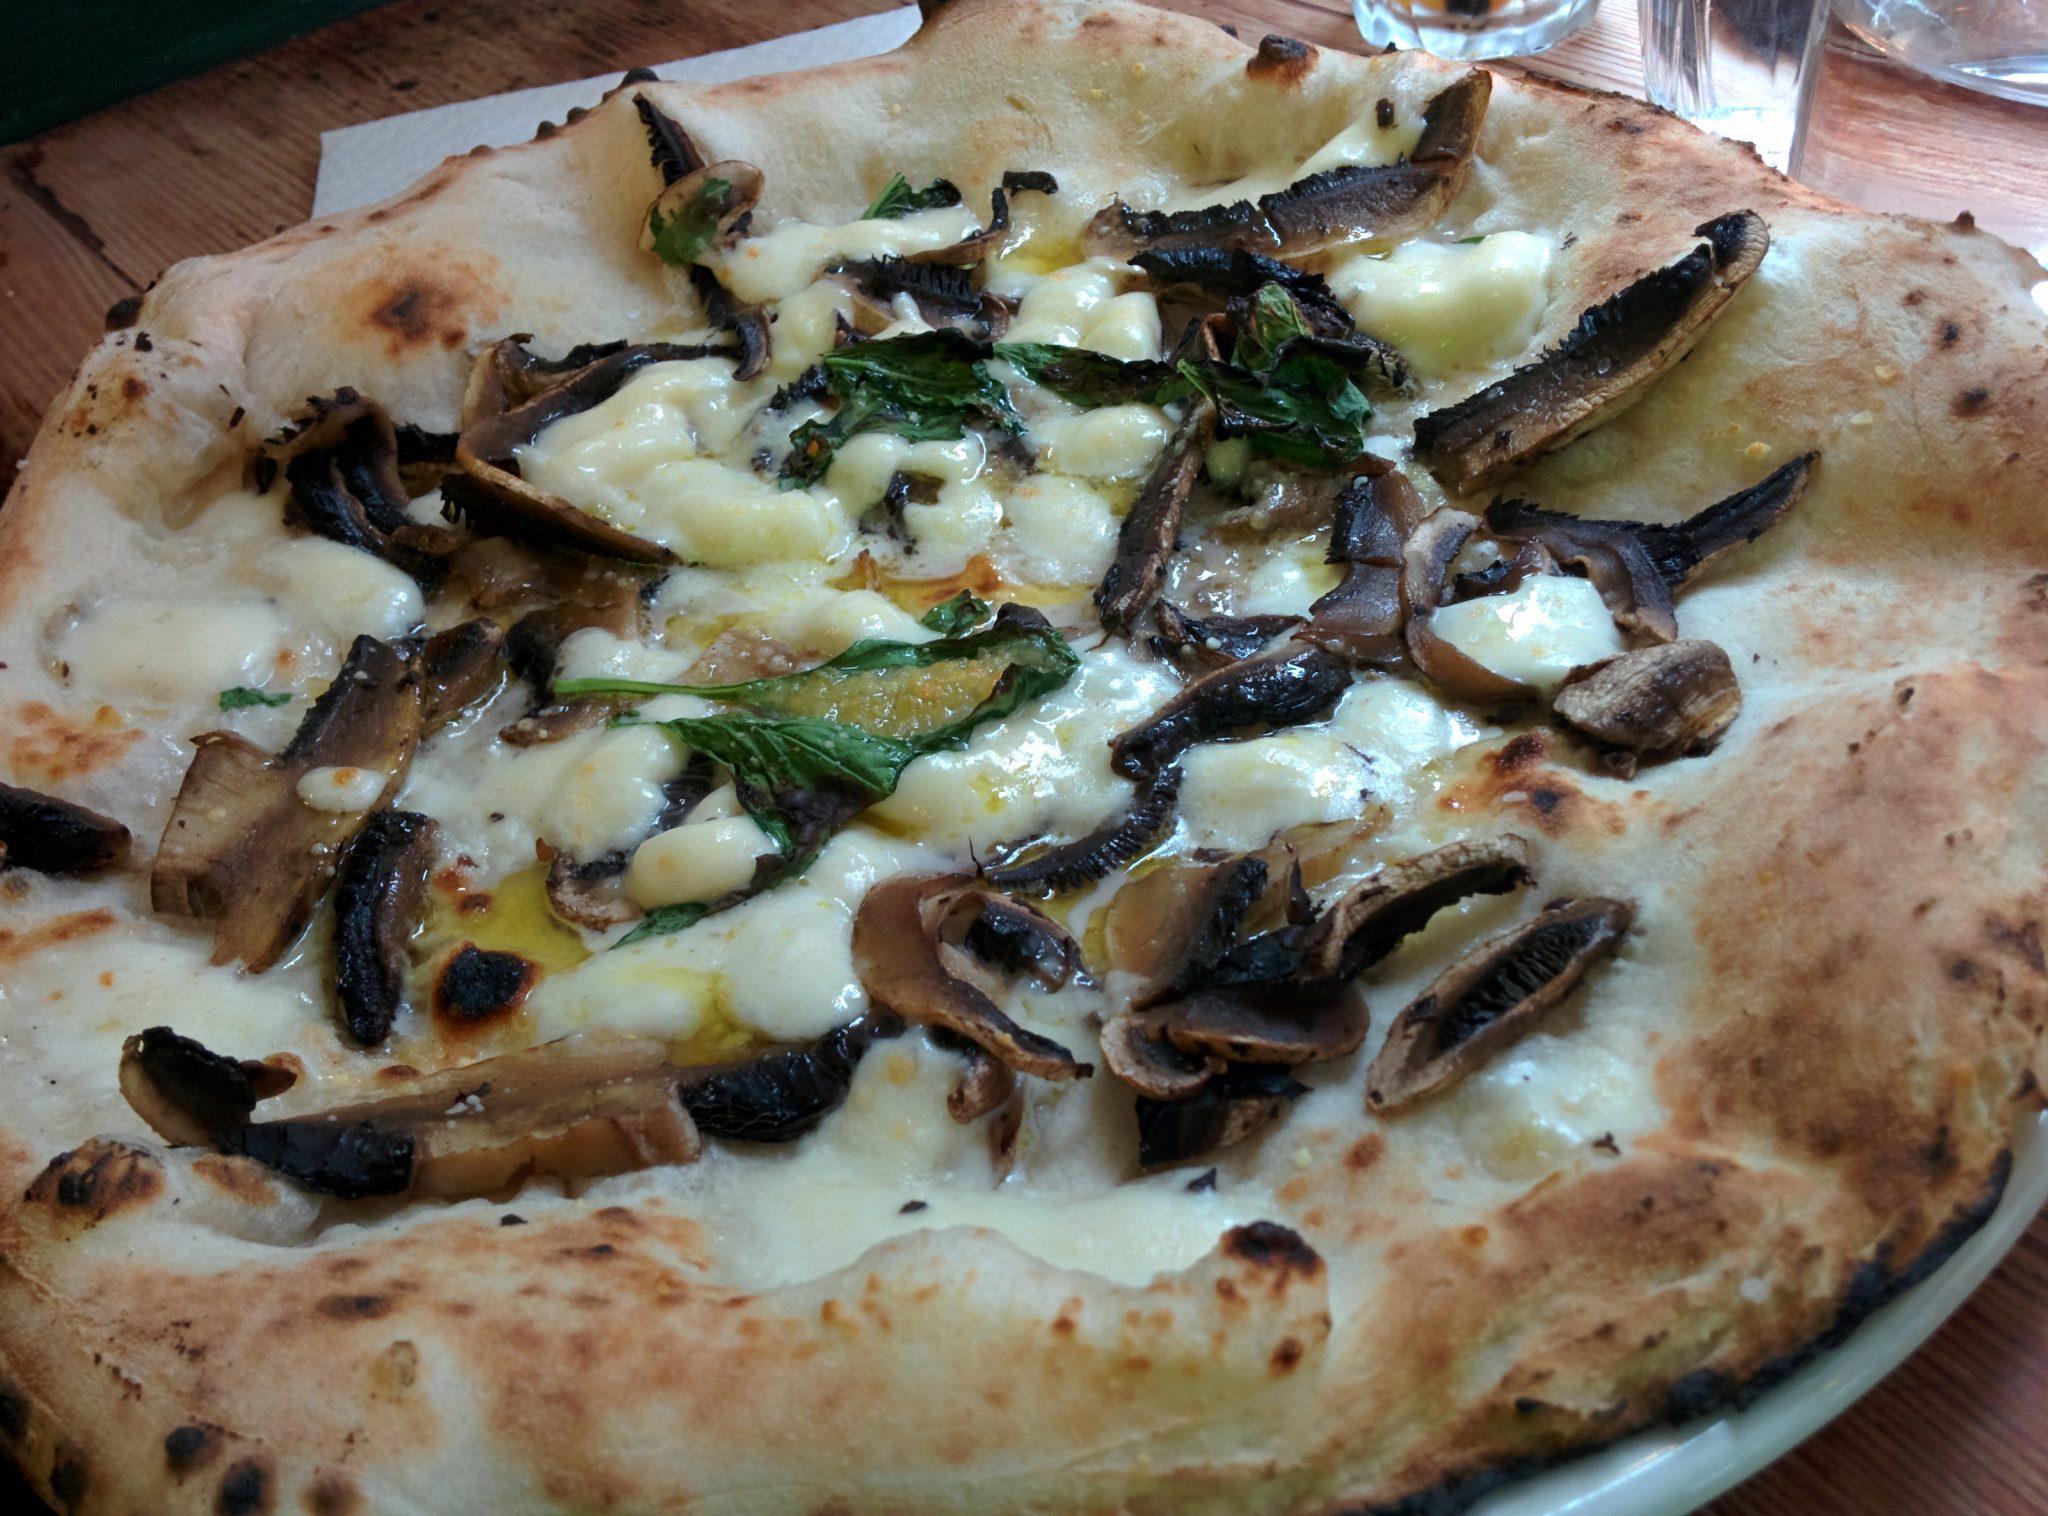 Pizza Pilgrims - New Yorker Meets London